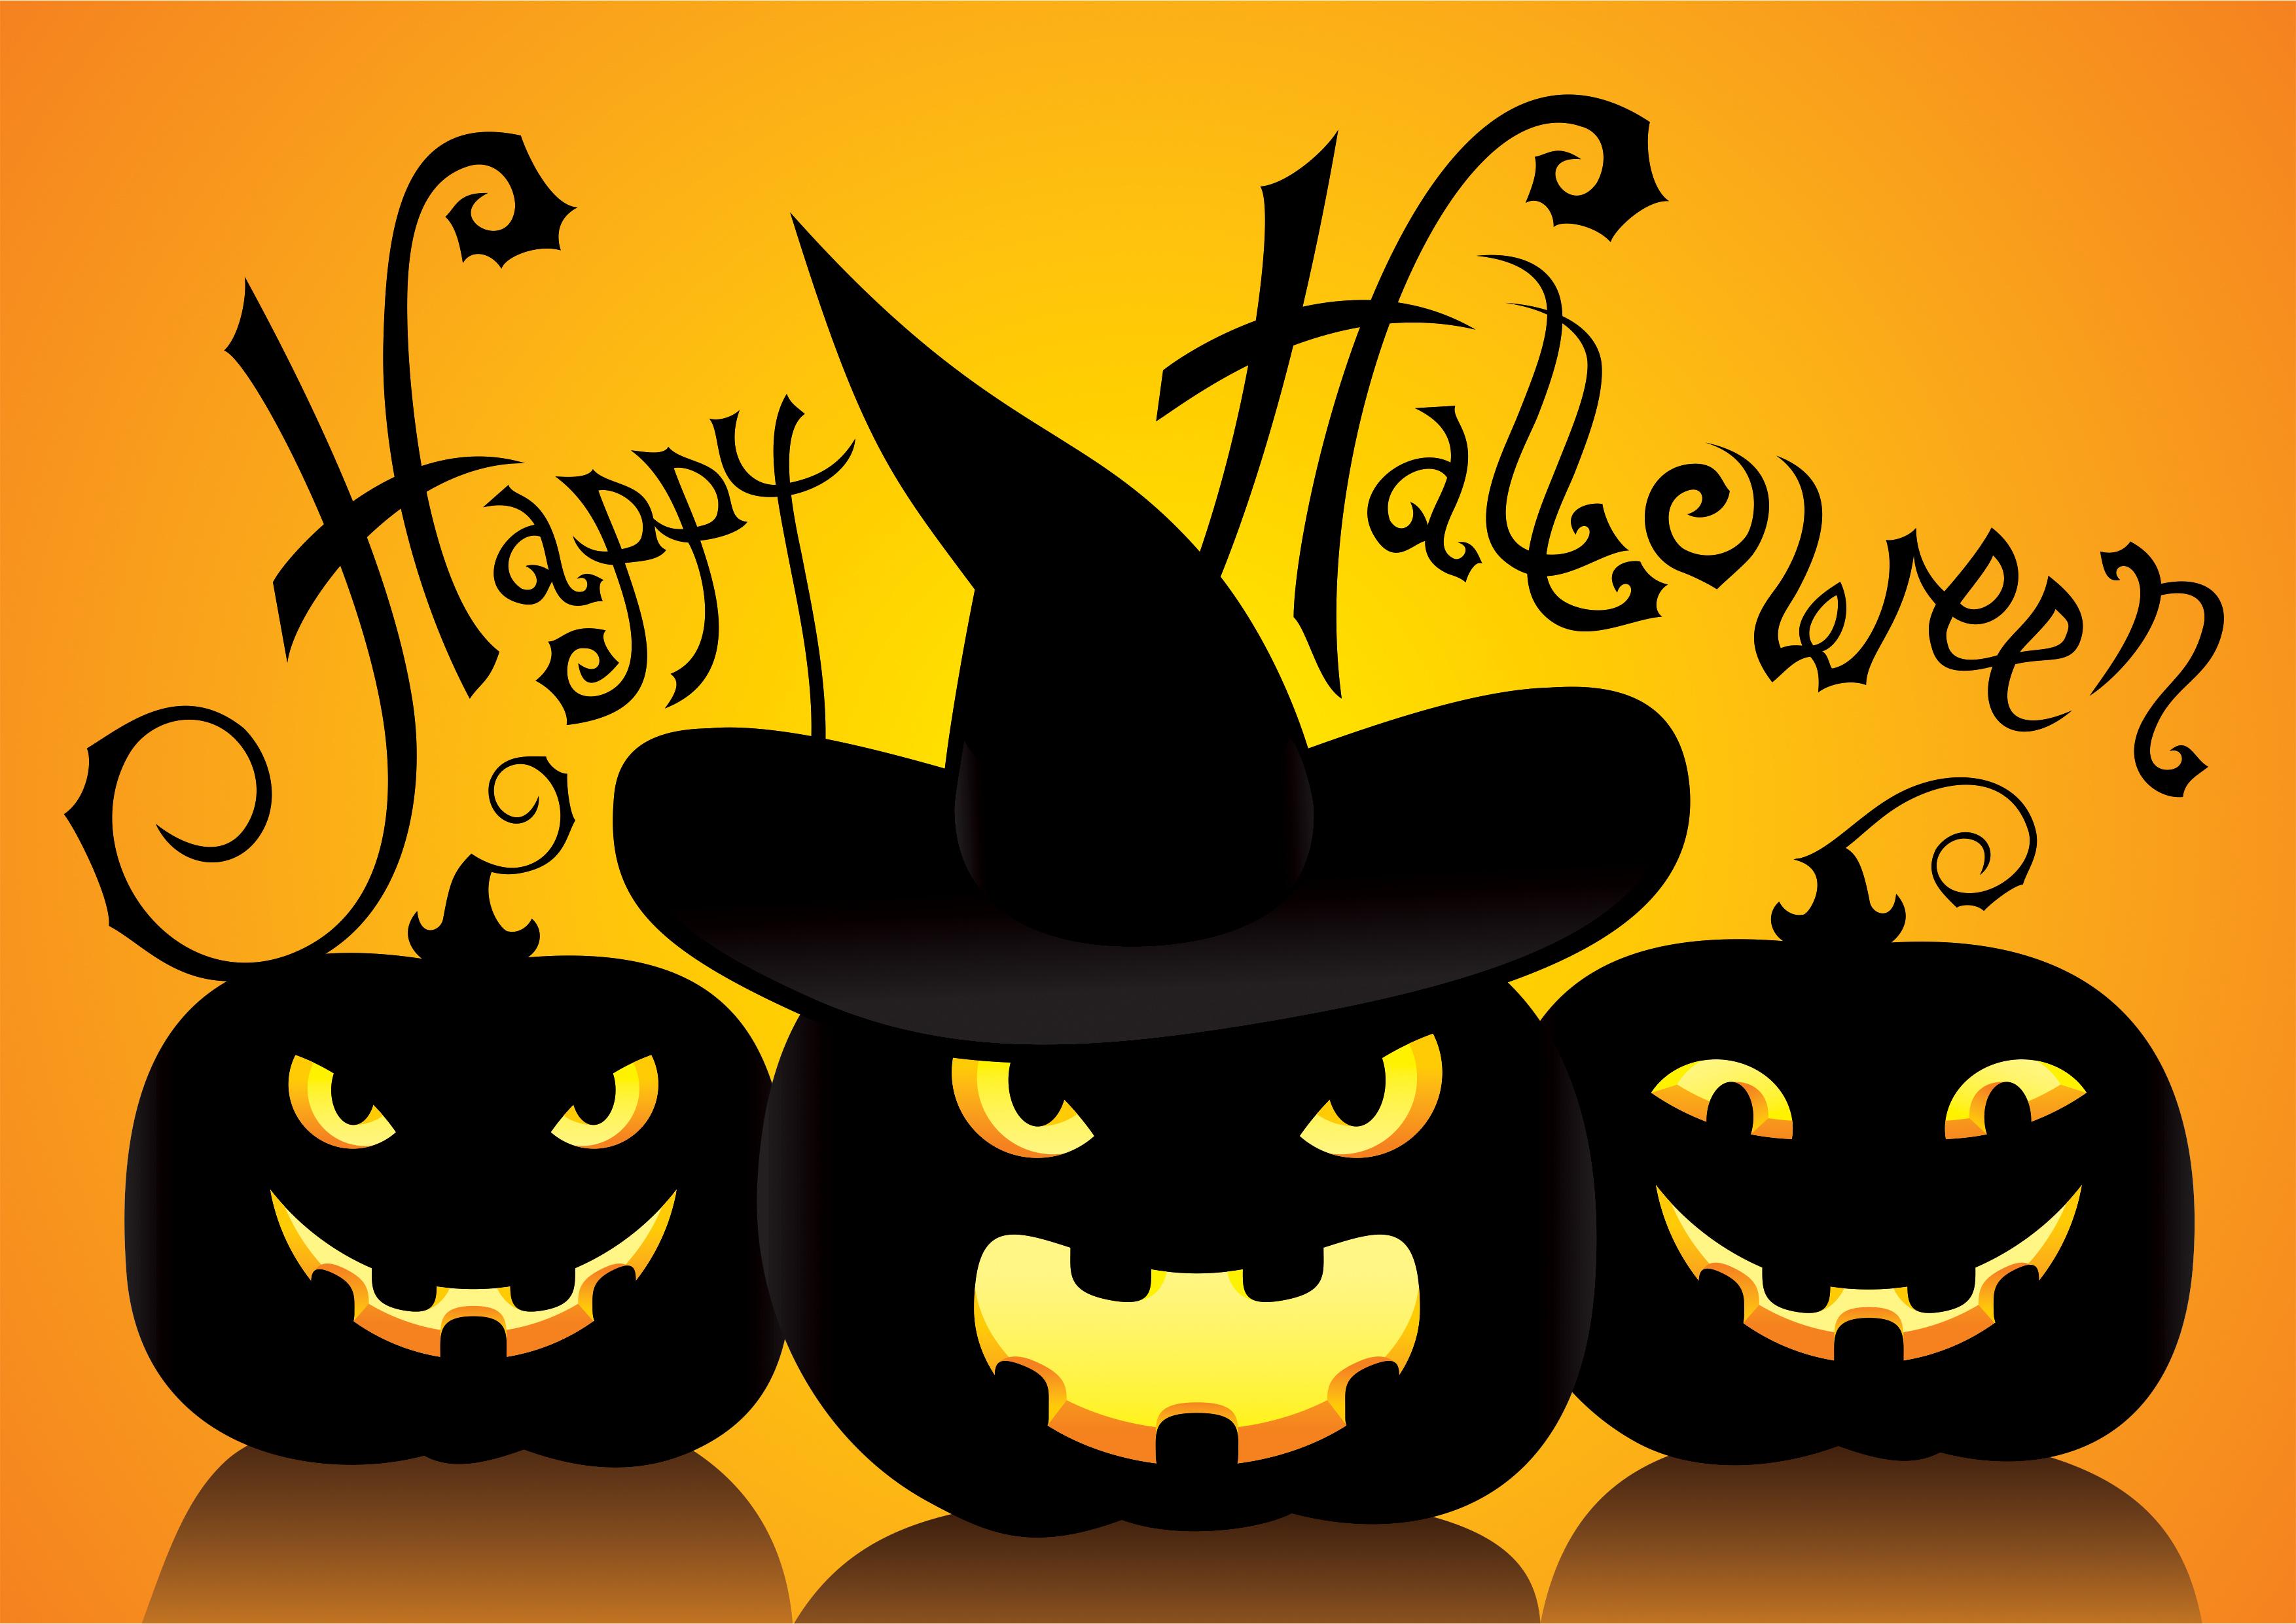 Happy Halloween from Club MAC